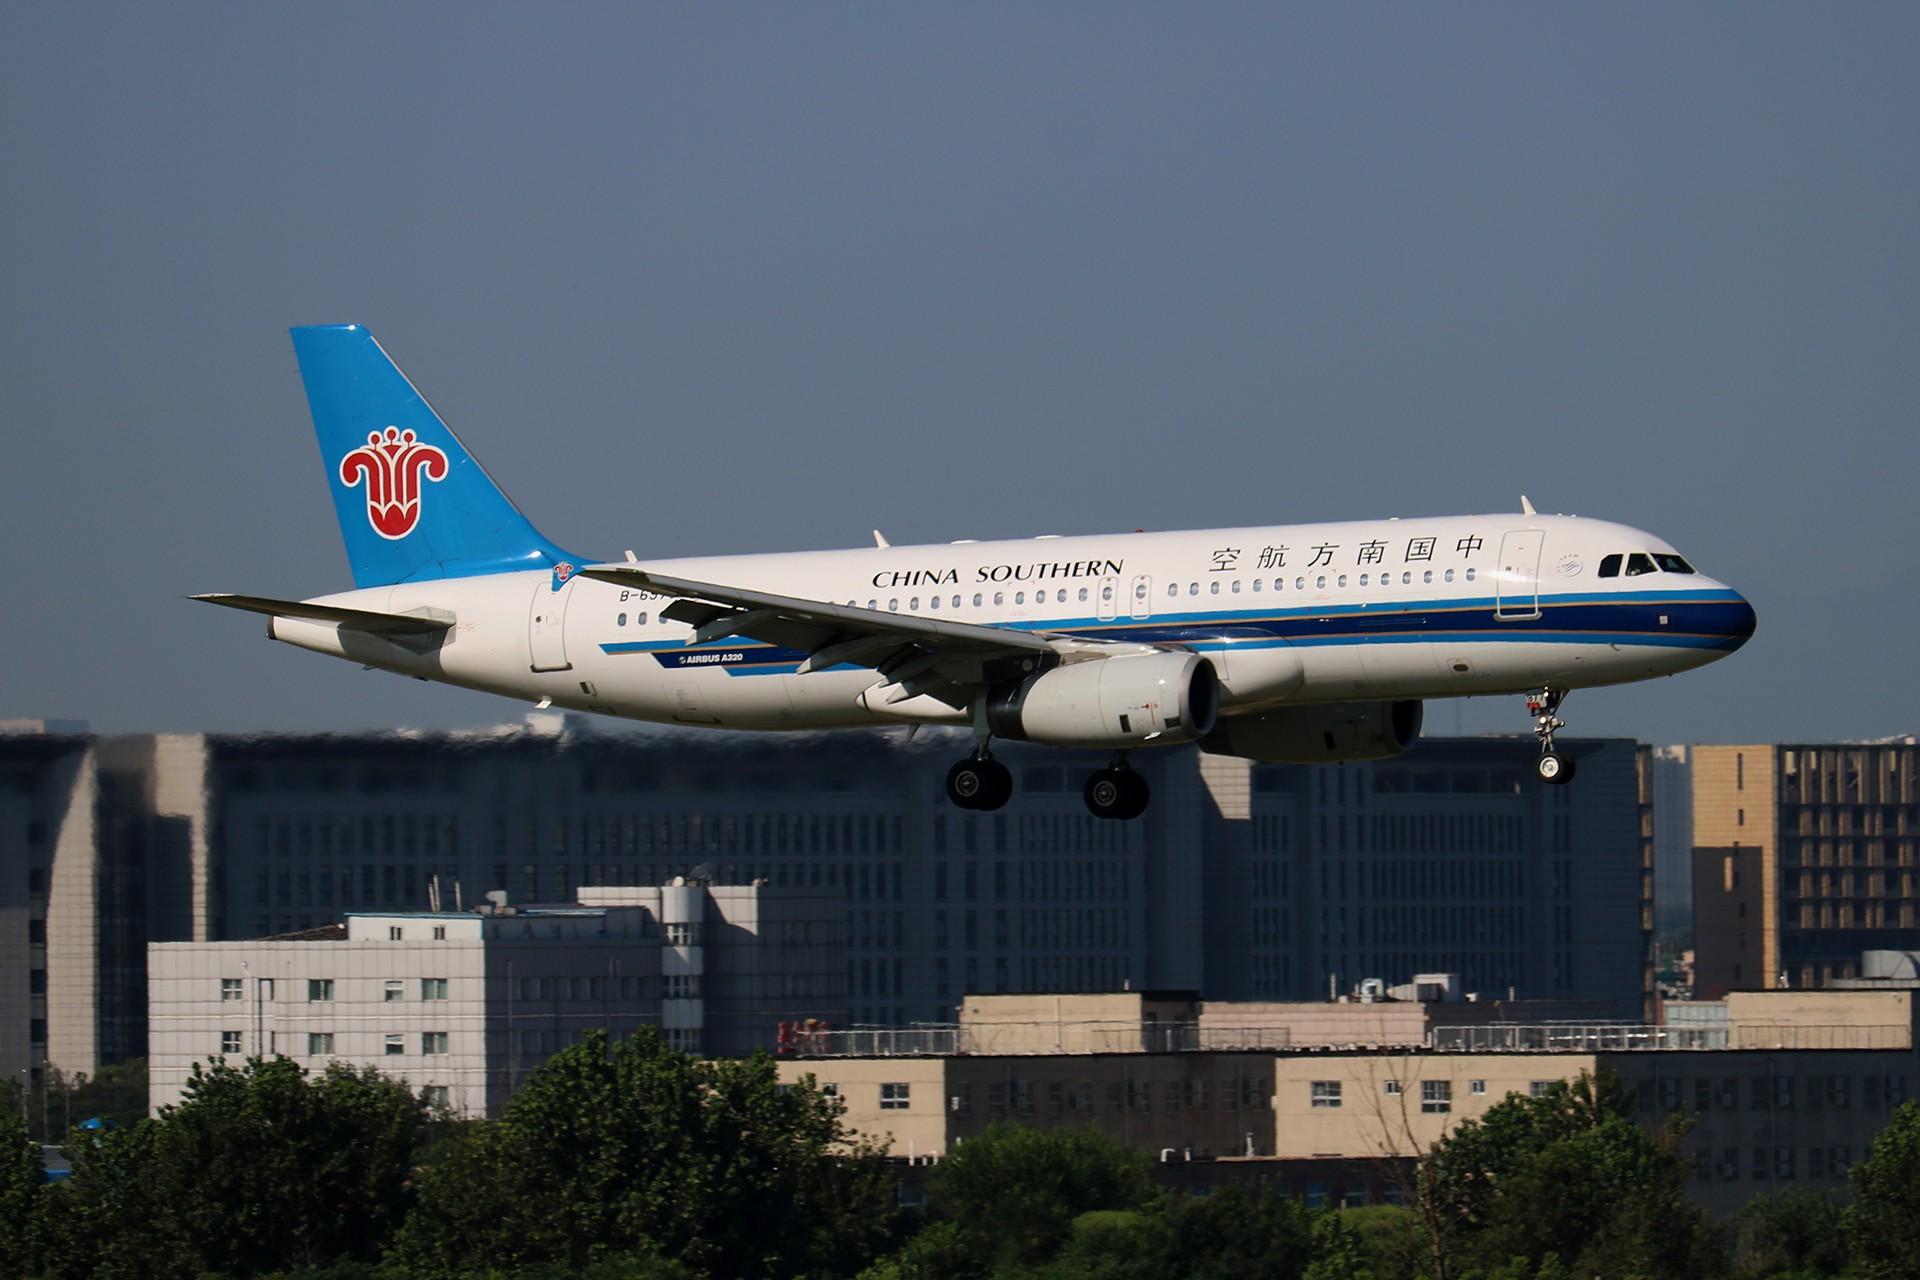 Re:[原创]LIULIU|【PEK】36L降落一组Ⅴ|城市背景下的进近 AIRBUS A320-200 B-6977 中国北京首都国际机场